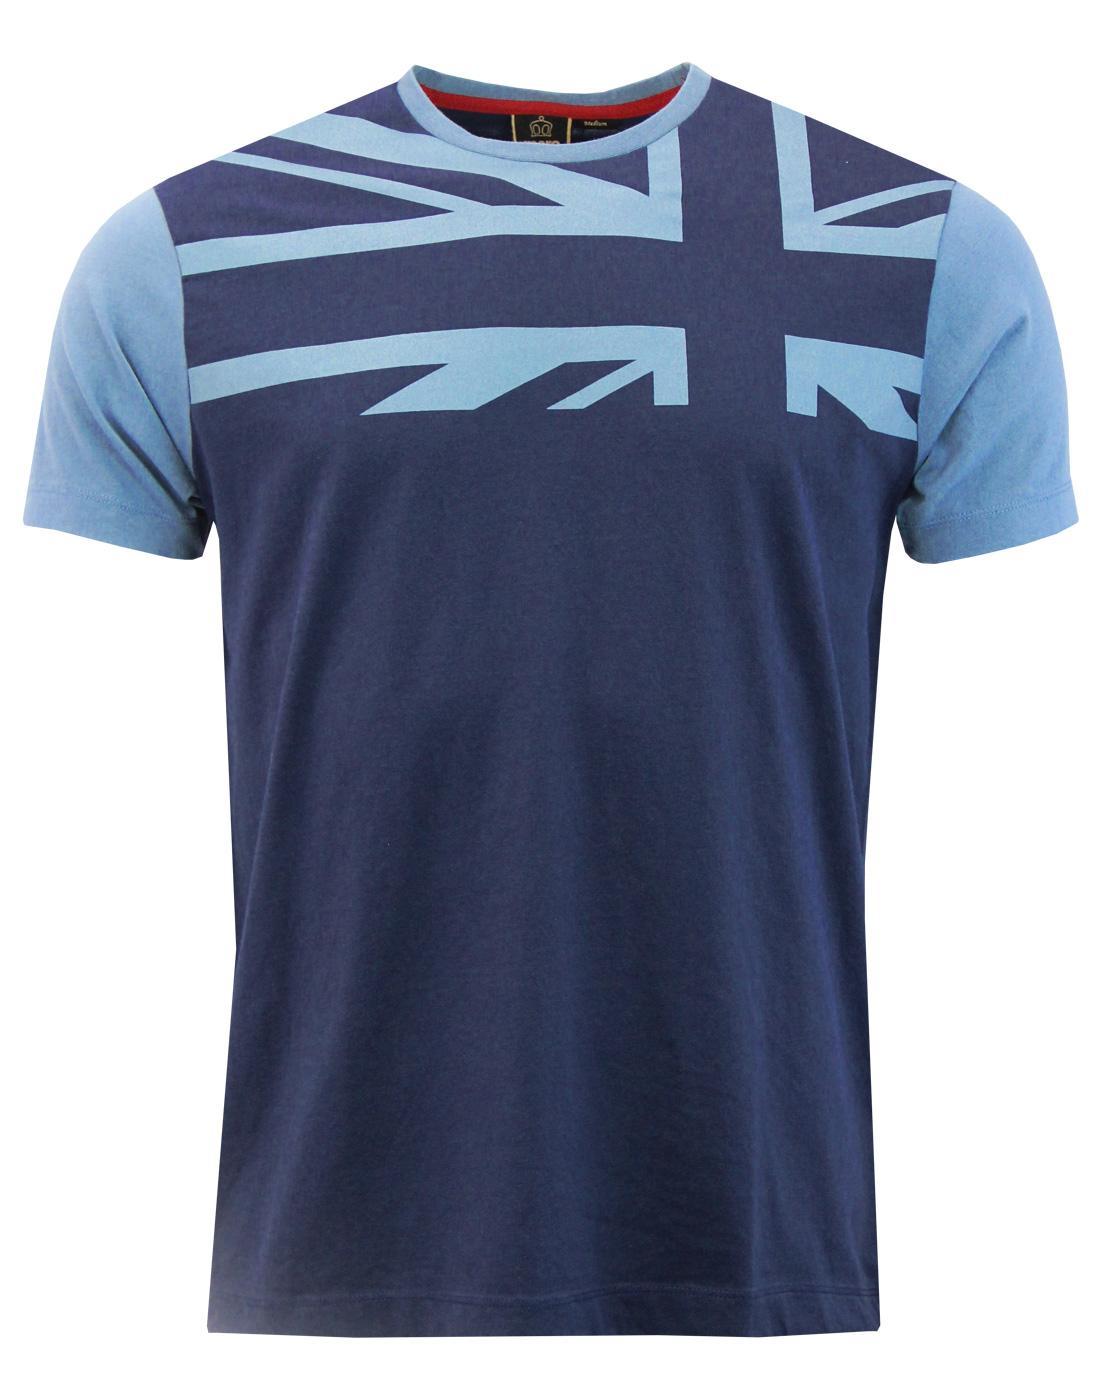 Crest MERC Retro Mod Union Jack Print T-Shirt (N)